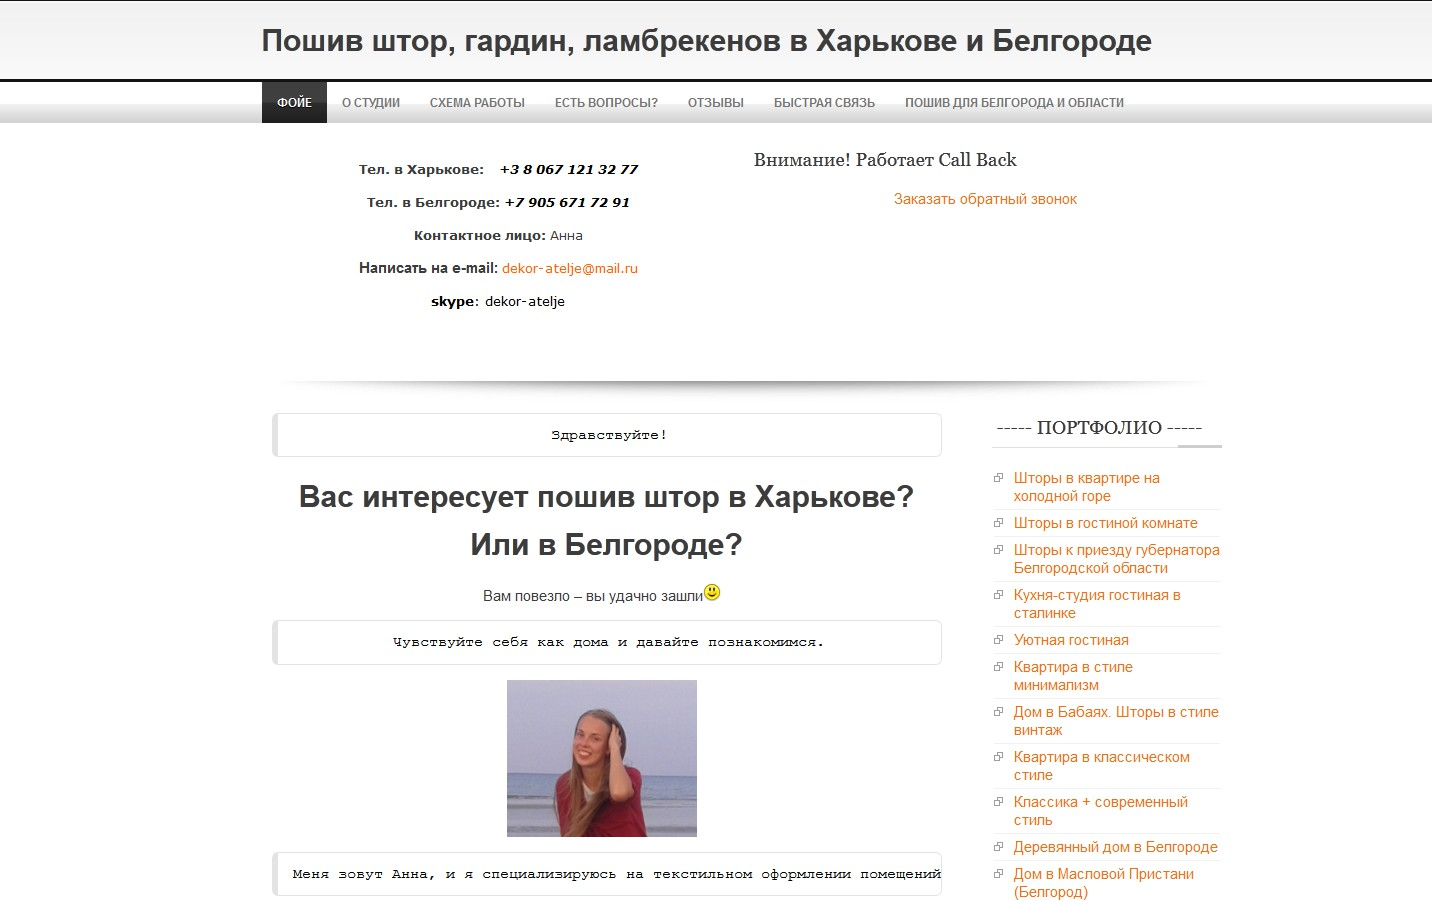 Сайты с частными фотографиями 5 фотография